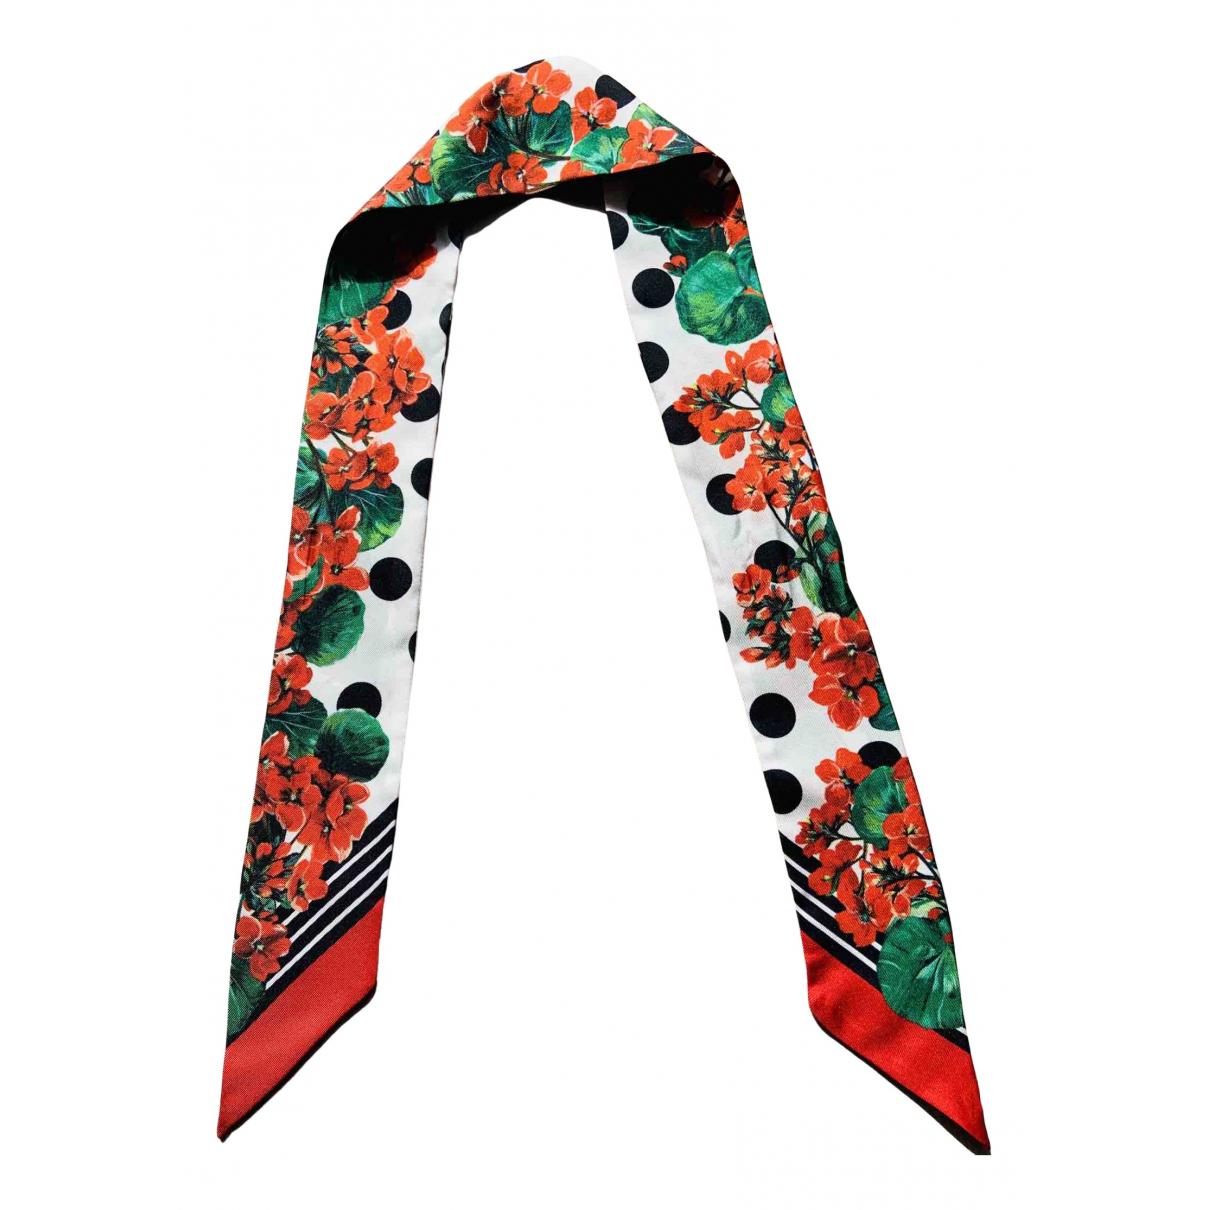 Dolce & Gabbana N Red Silk scarf for Women N